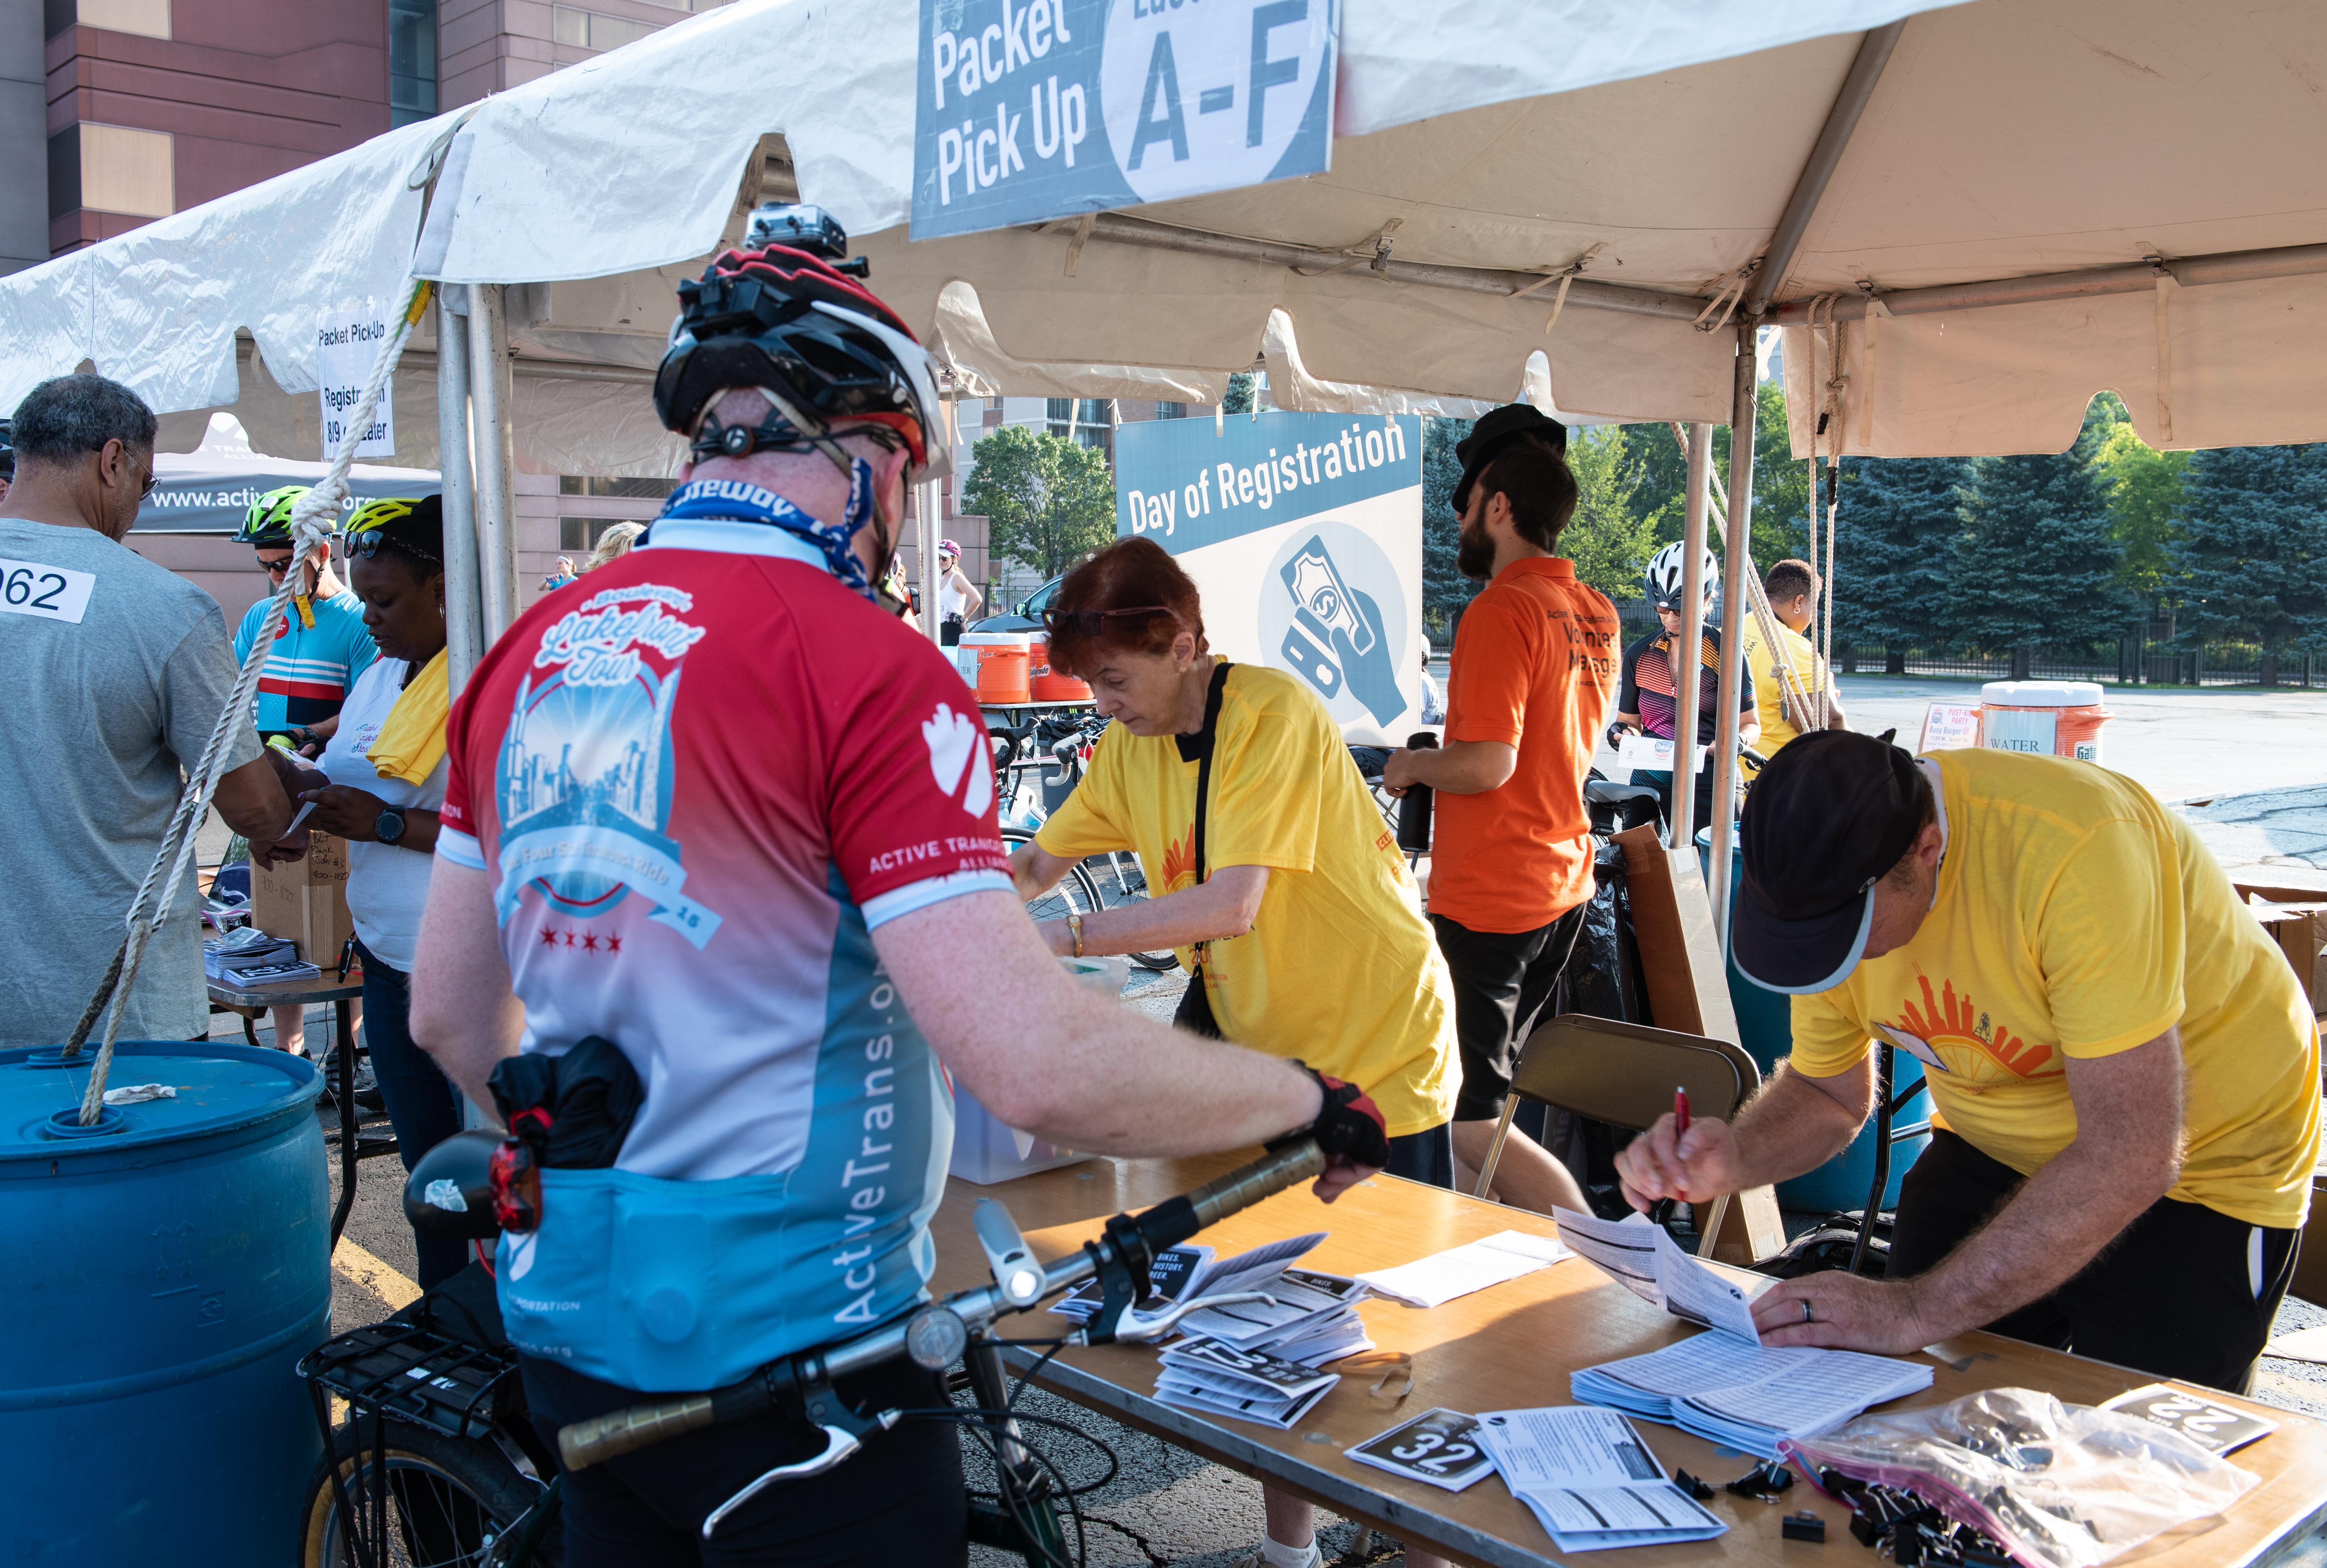 Community Service Organization - Volunteer for Boulevard Lakefront Tour bike ride!  2